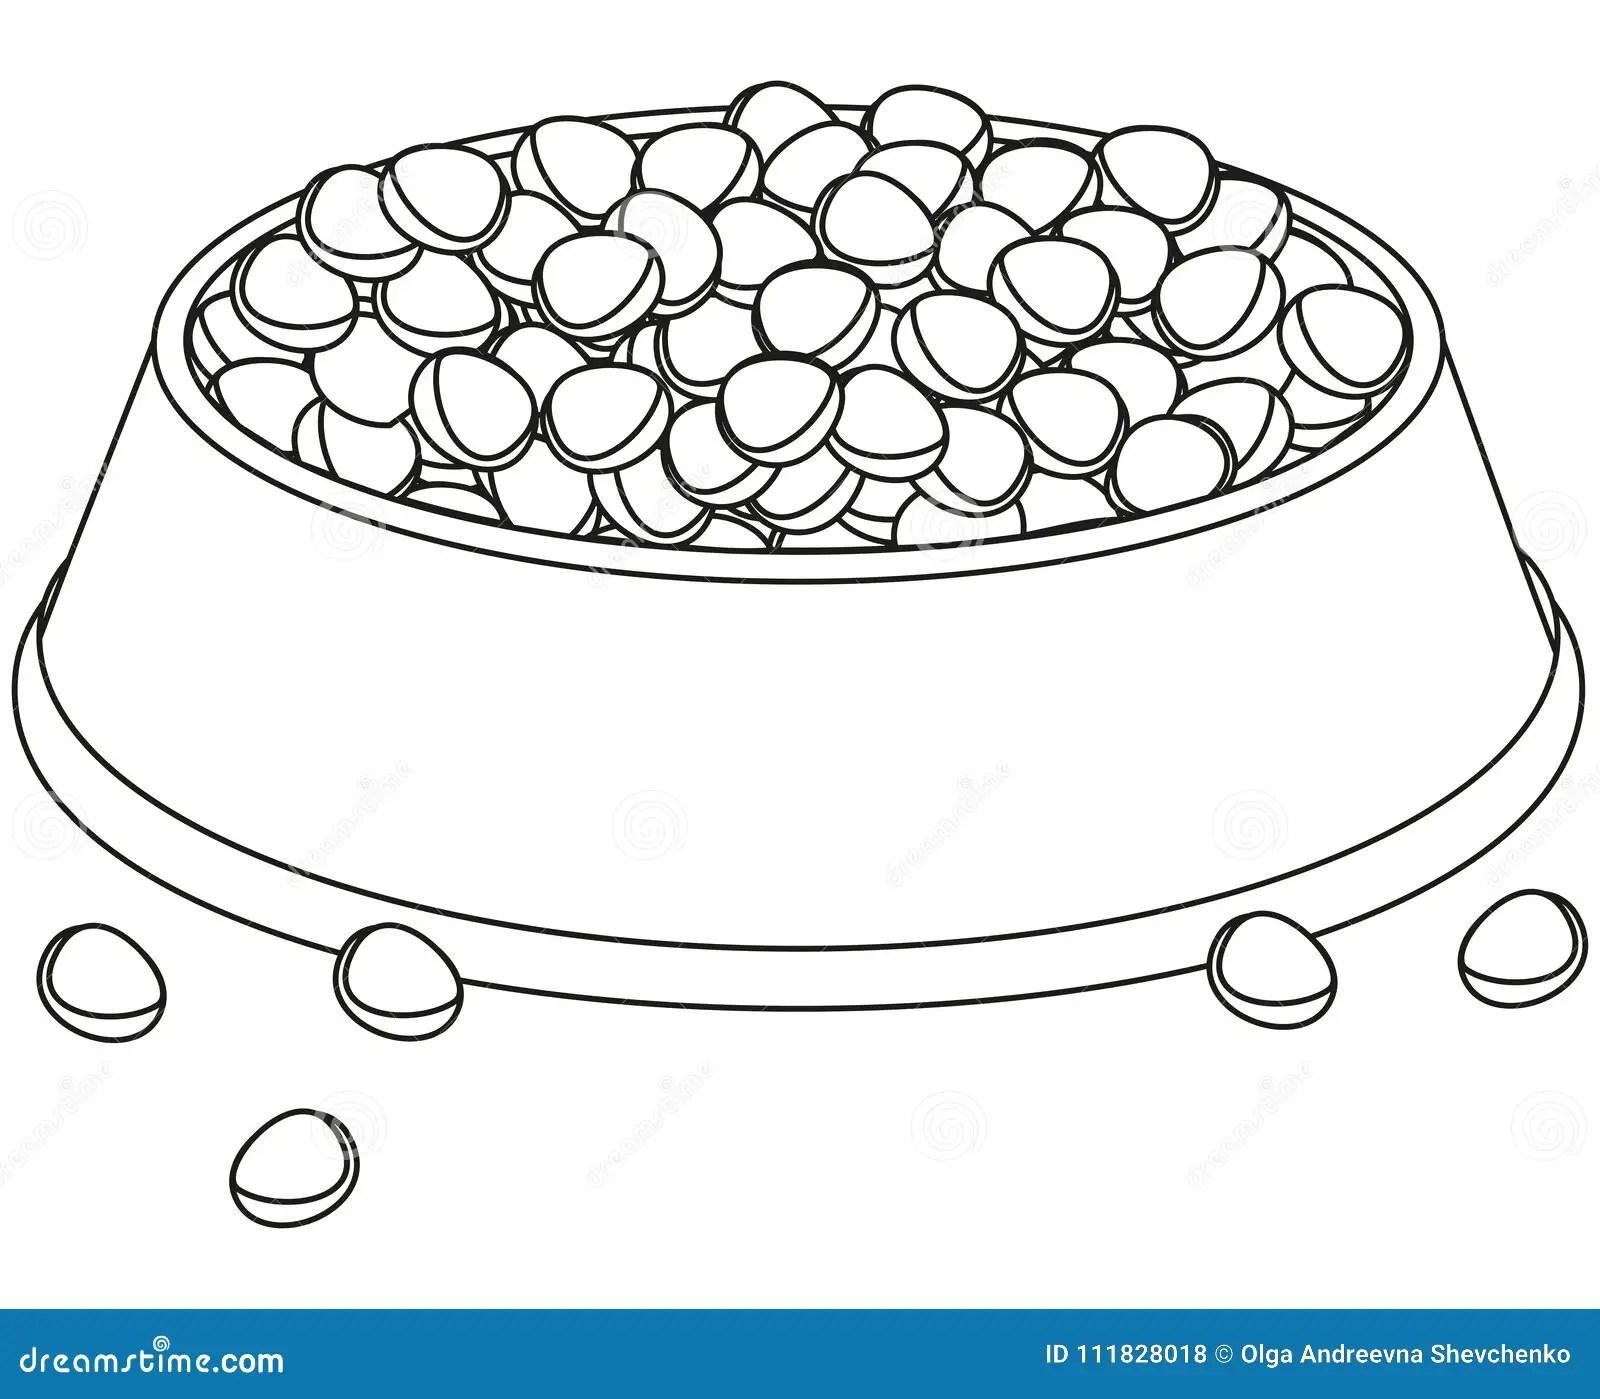 Line Art Black And White Full Pet Food Bowl Stock